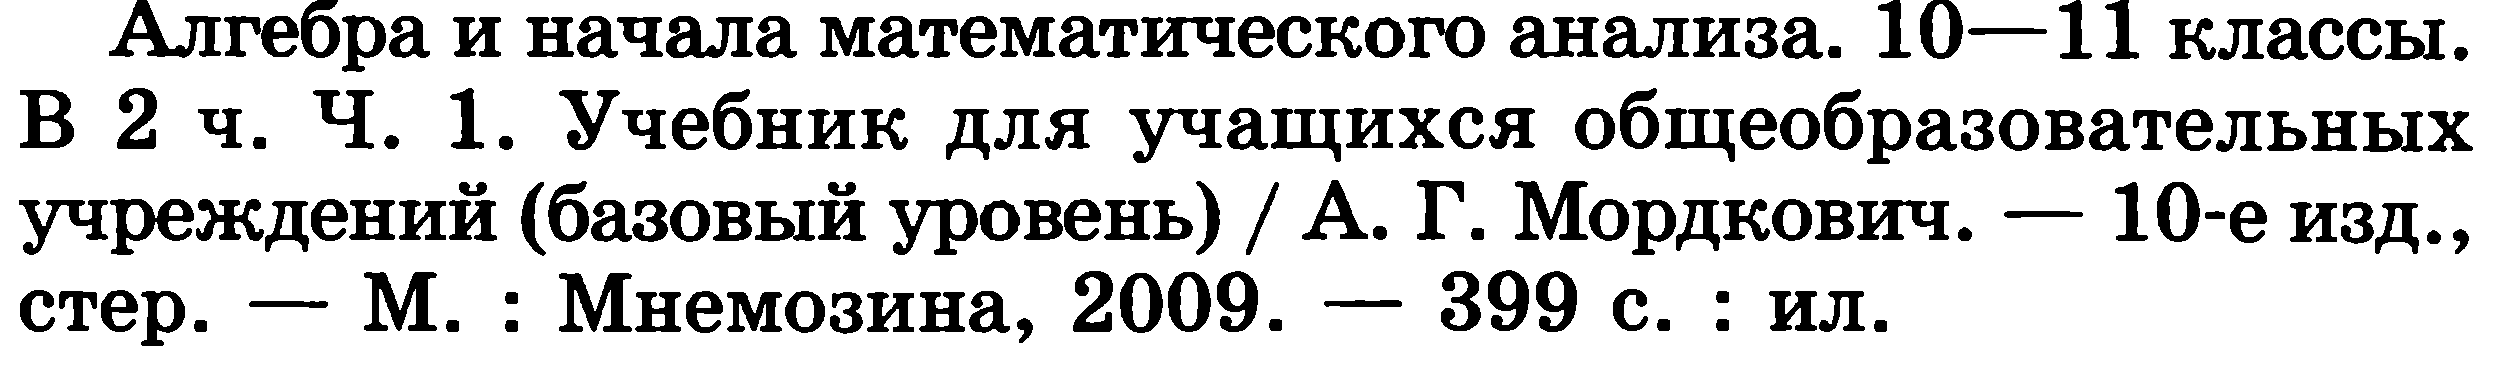 hello_html_m4e21fb53.png